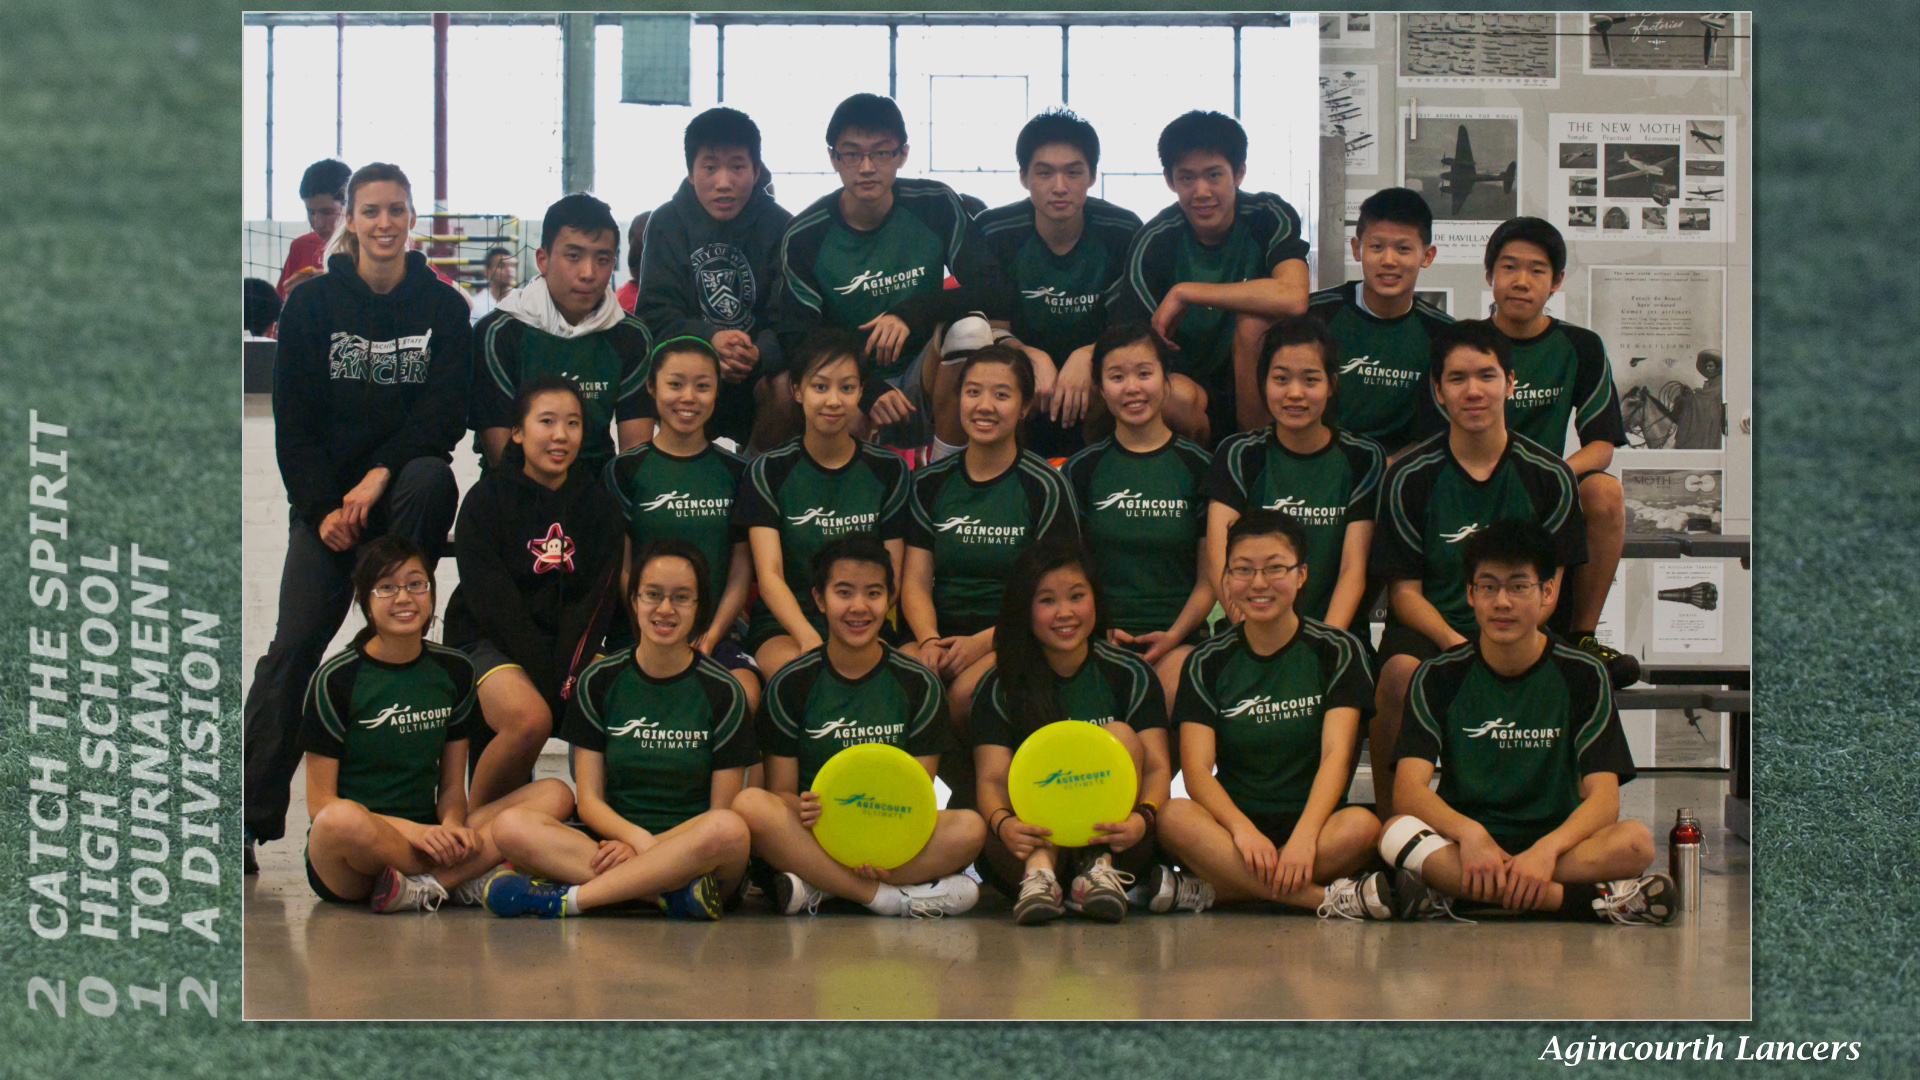 toronto ultimate club Toronto elites ultimate, toronto, ontario 819 likes a competitive junior ultimate frisbee club located in toronto, ontario.